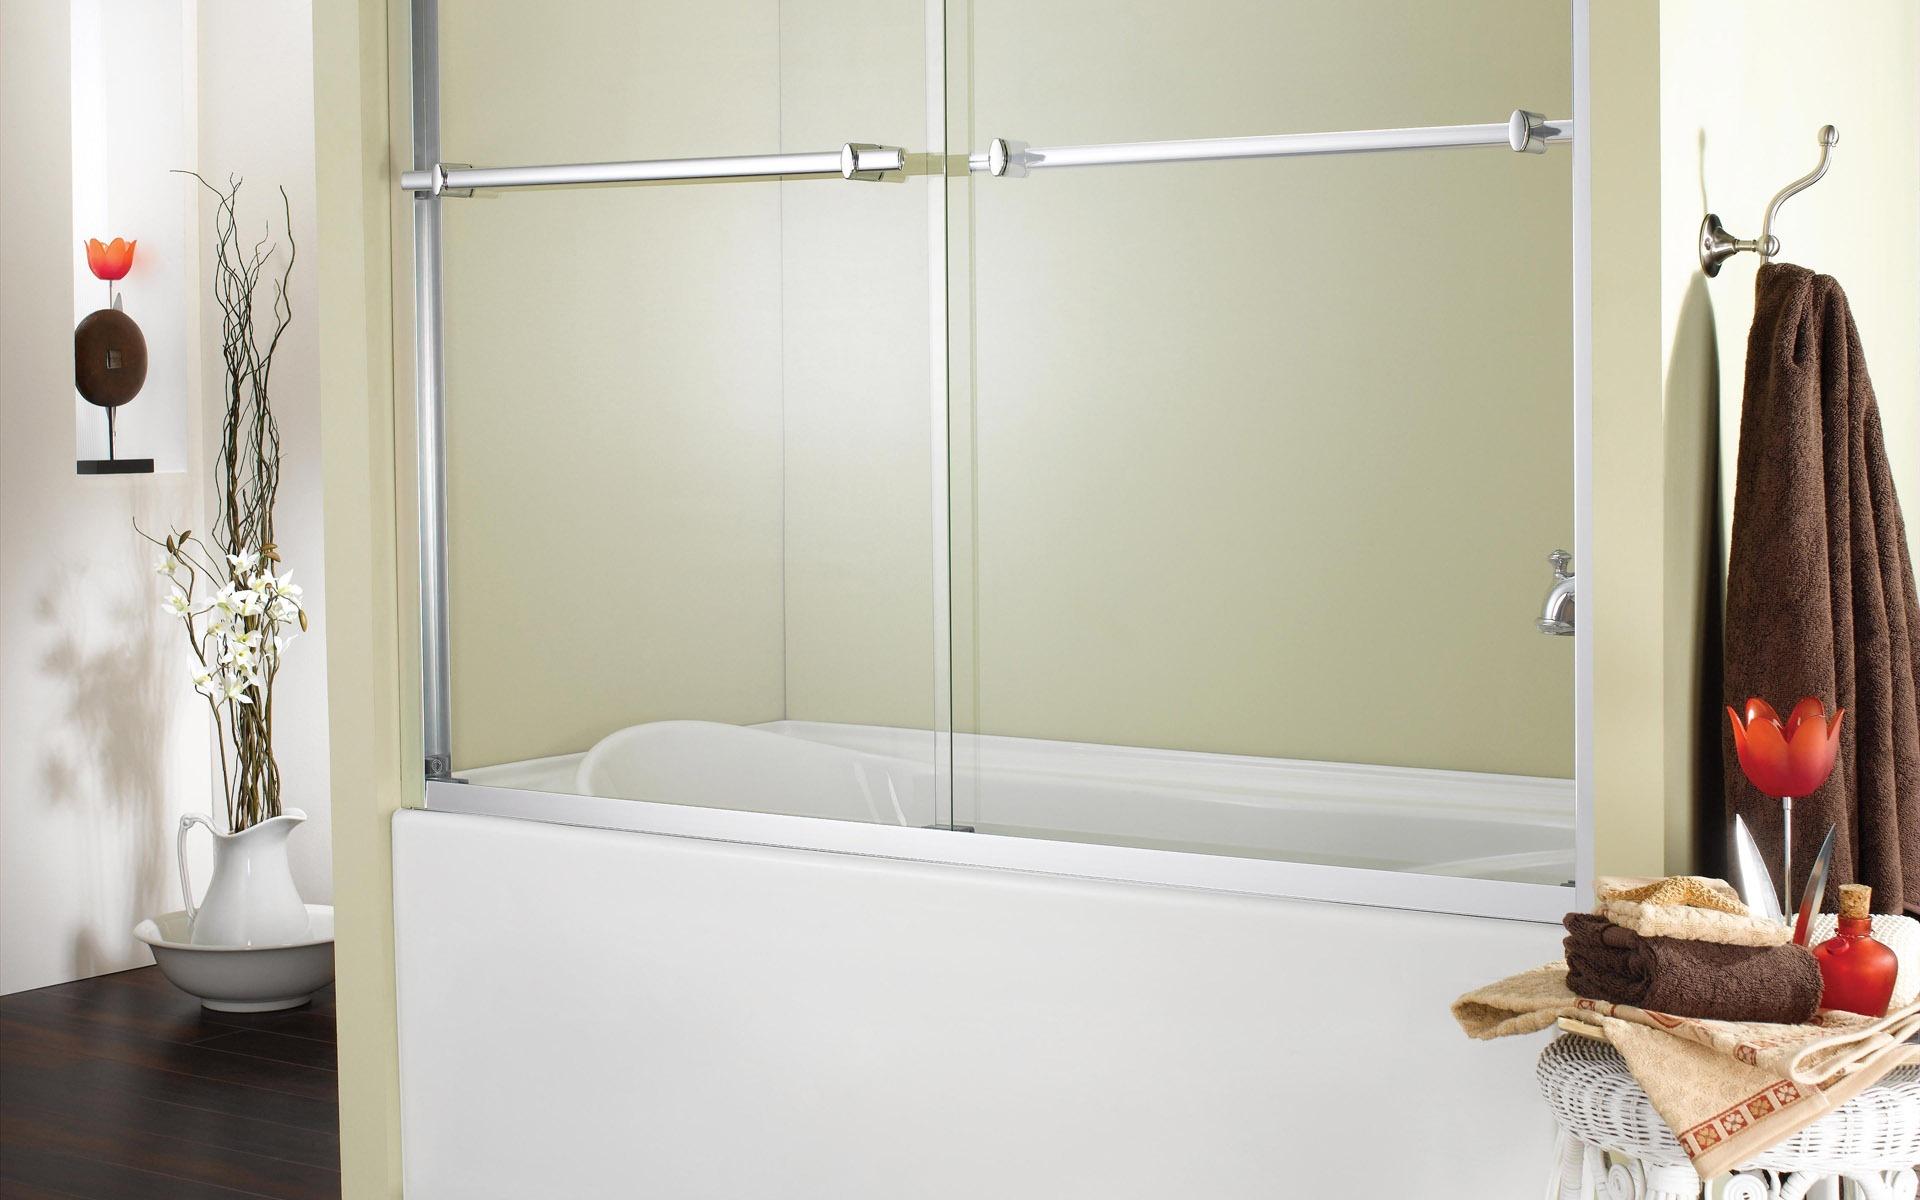 Fond d 39 cran photo salle de bain 2 15 1920x1200 fond for Ecran salle de bain